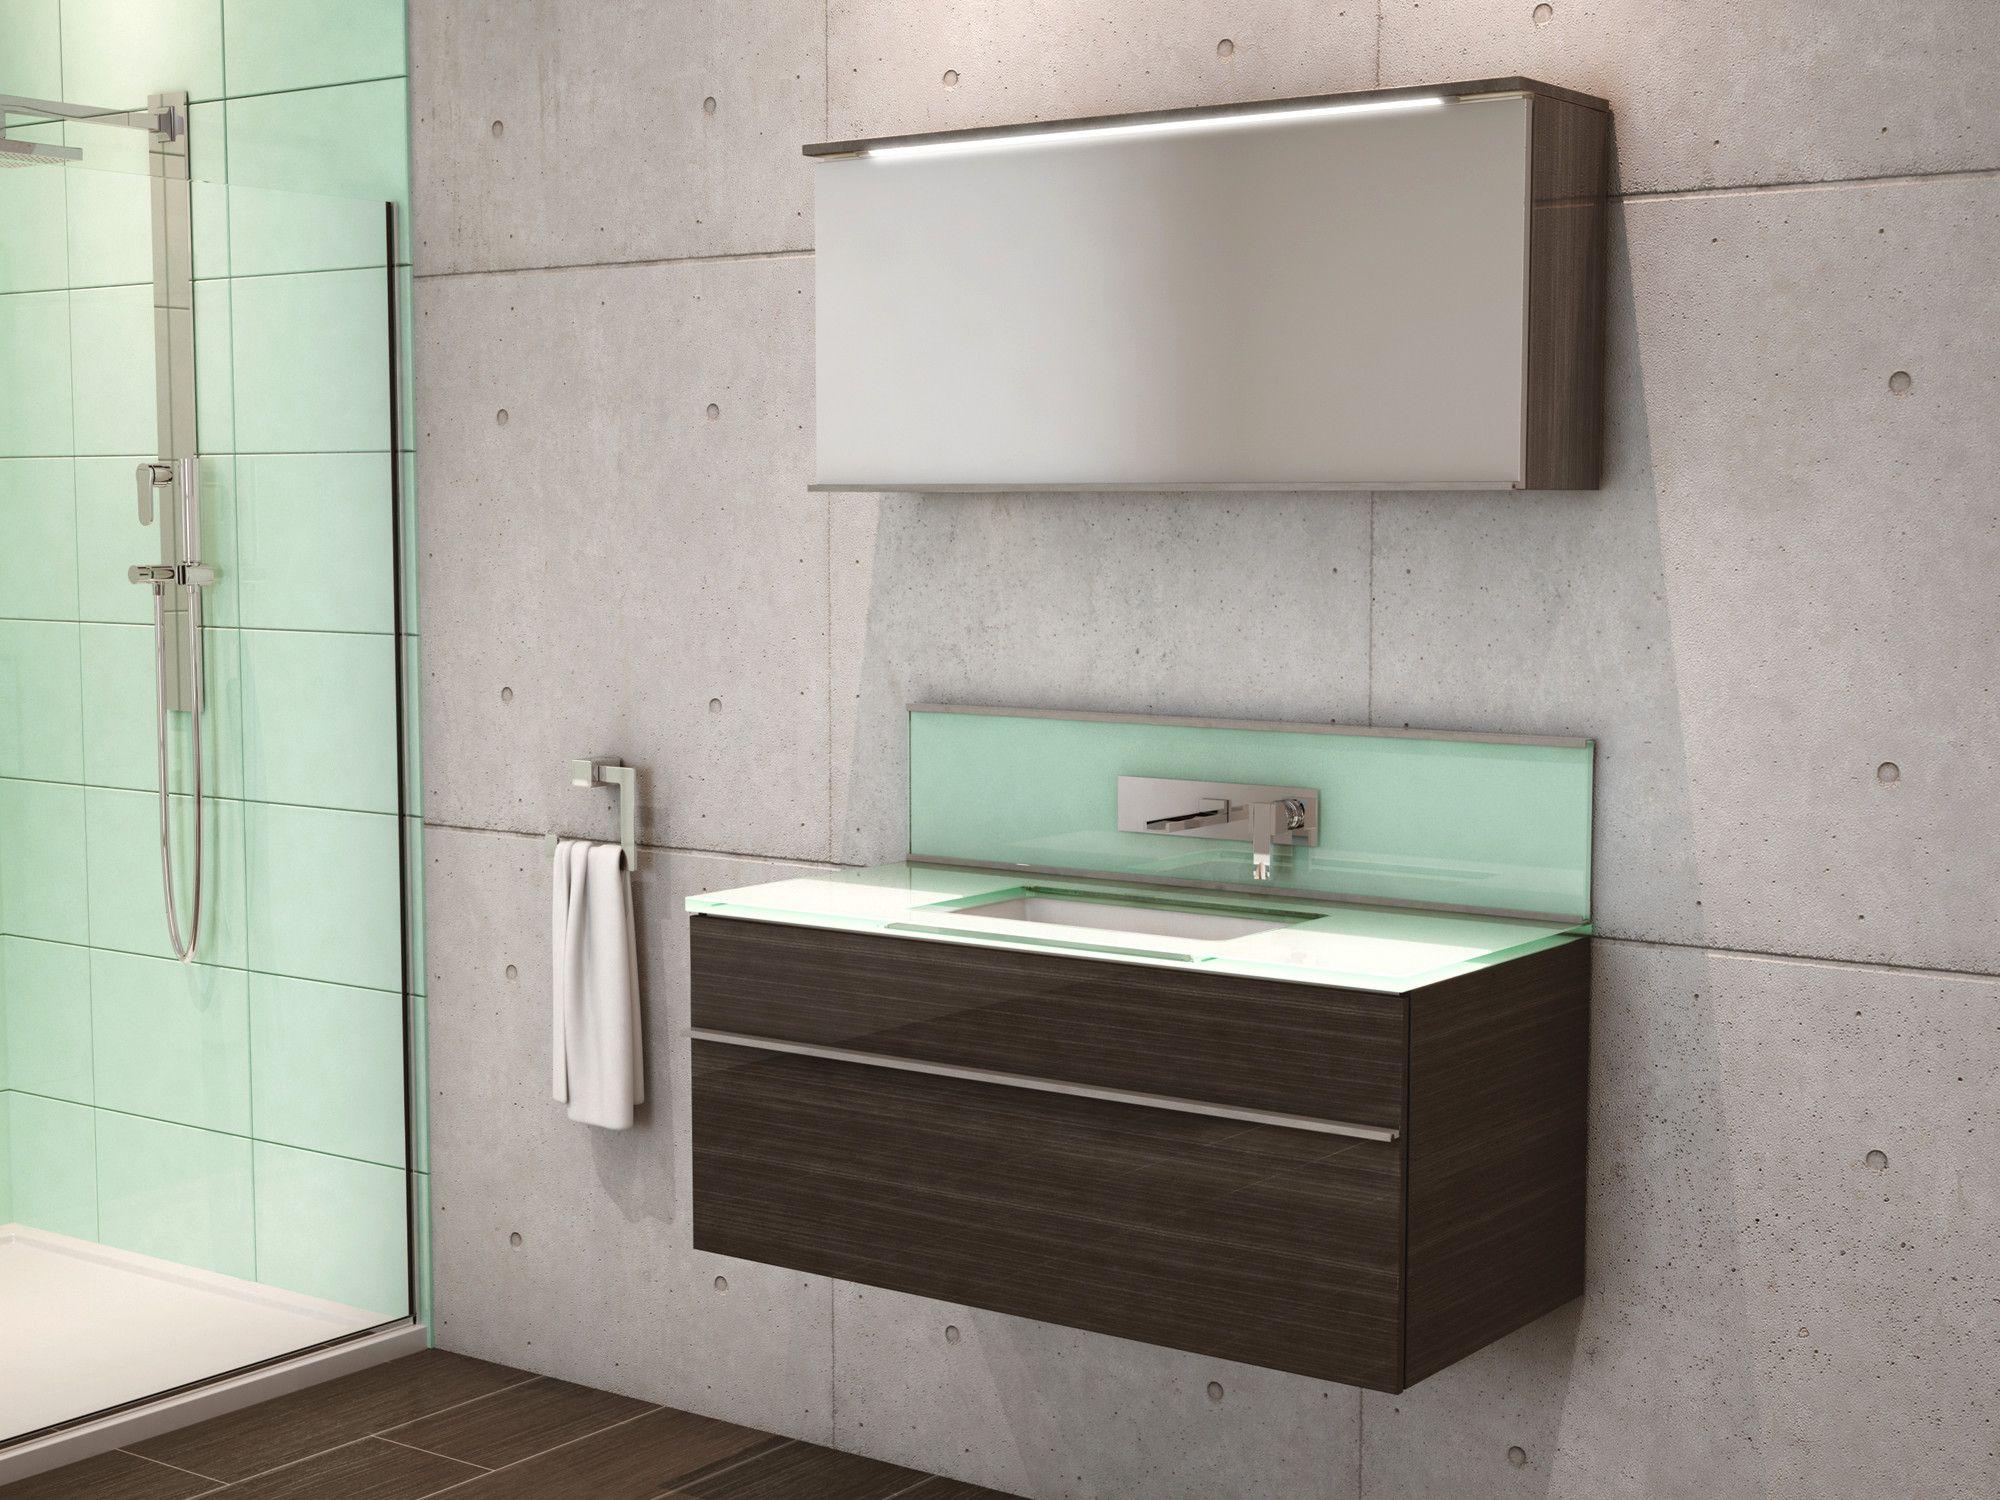 Lavabos Et Vanit S Salle De Bain Lacroix D Cor Avec Vanite Lavabo Et Meuble De Salle De Bains Design 38 2000x Bathroom Design Floating Nightstand Single Vanity